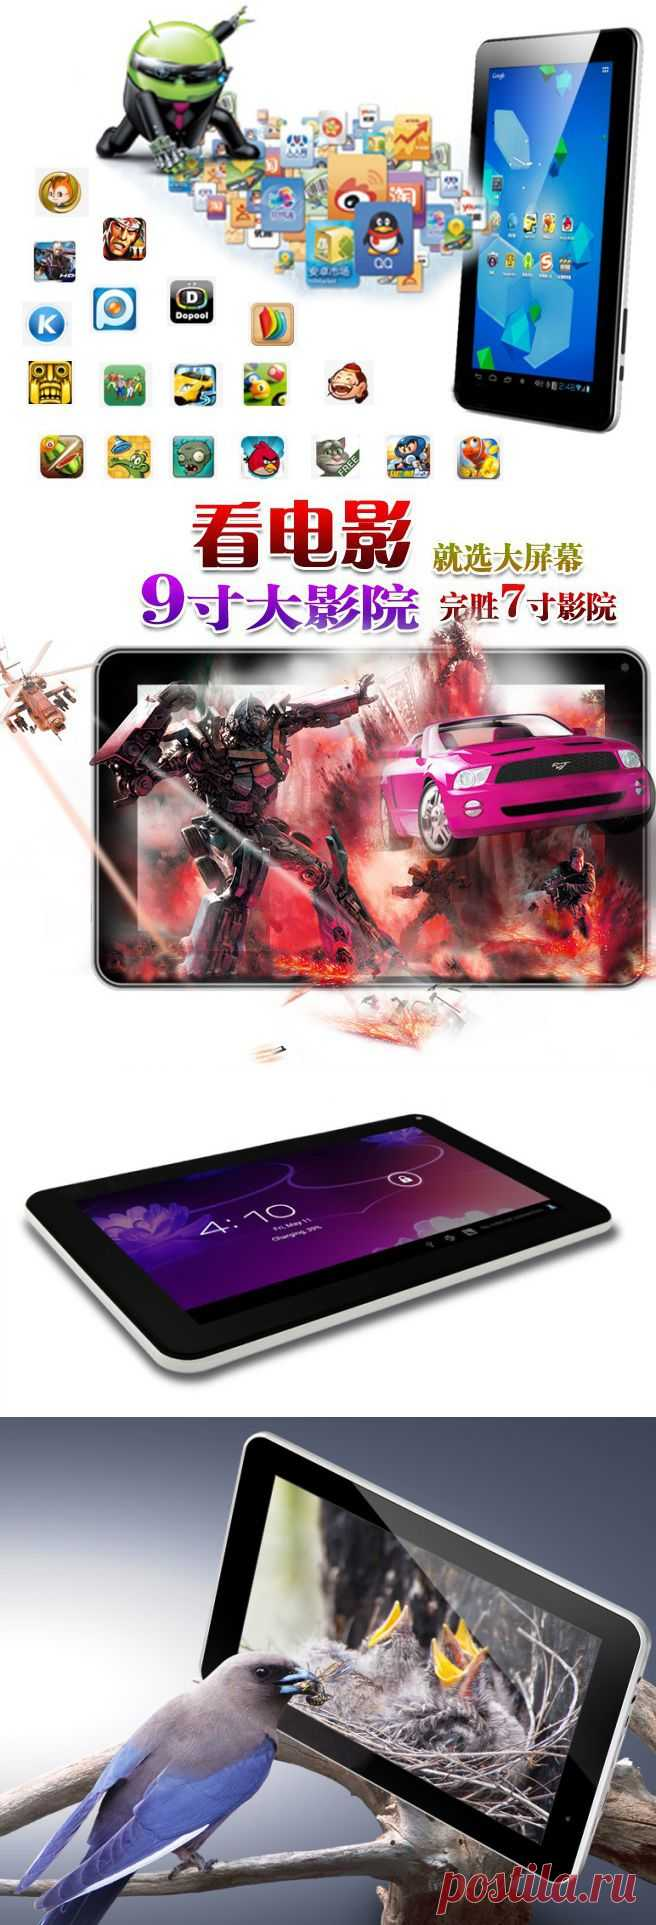 mz82-Q9 9-дюймовый планшет Android 4.0